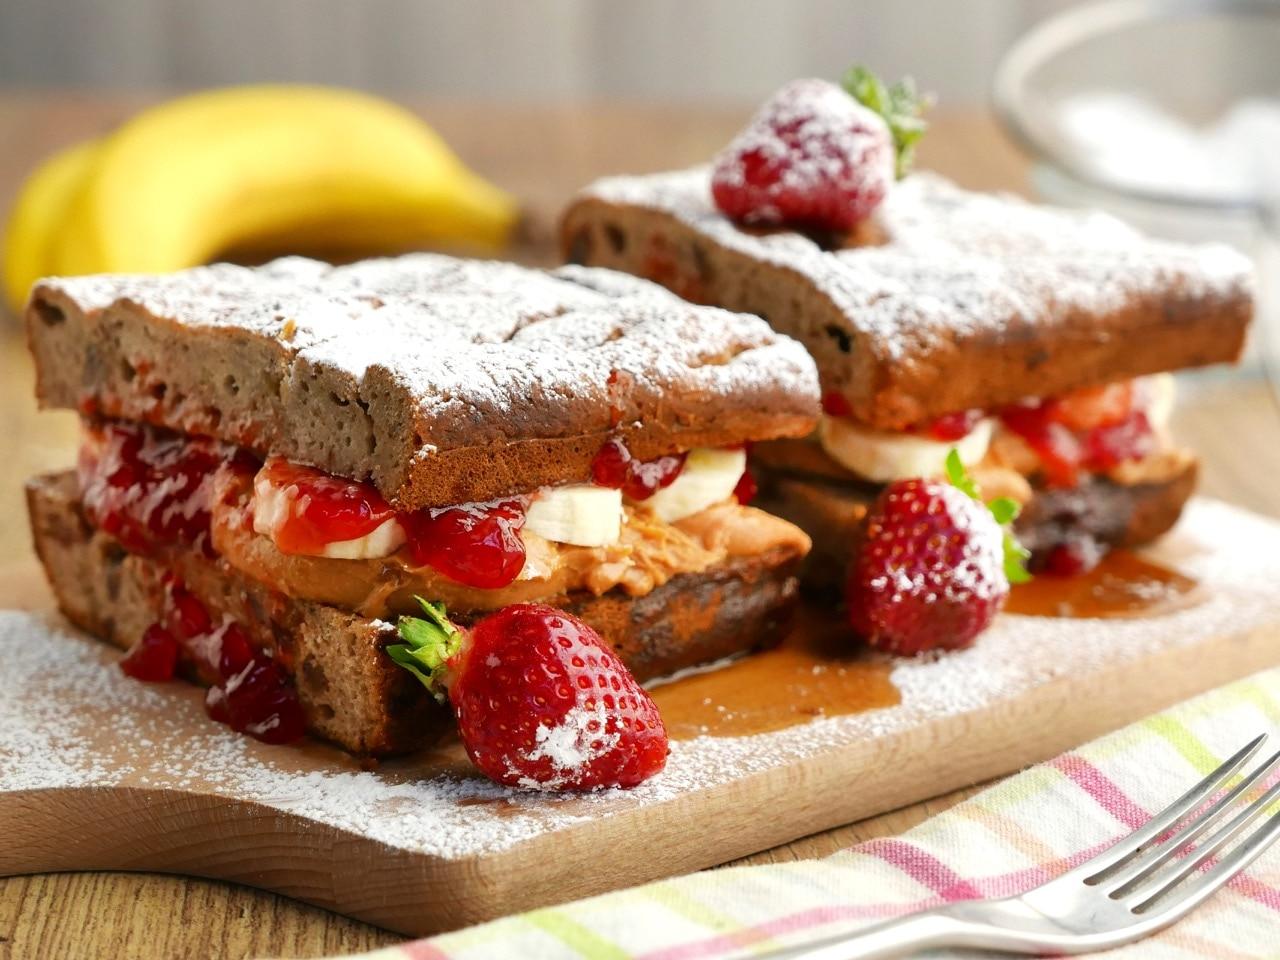 Gluten Free Banana Bread Sandwiches